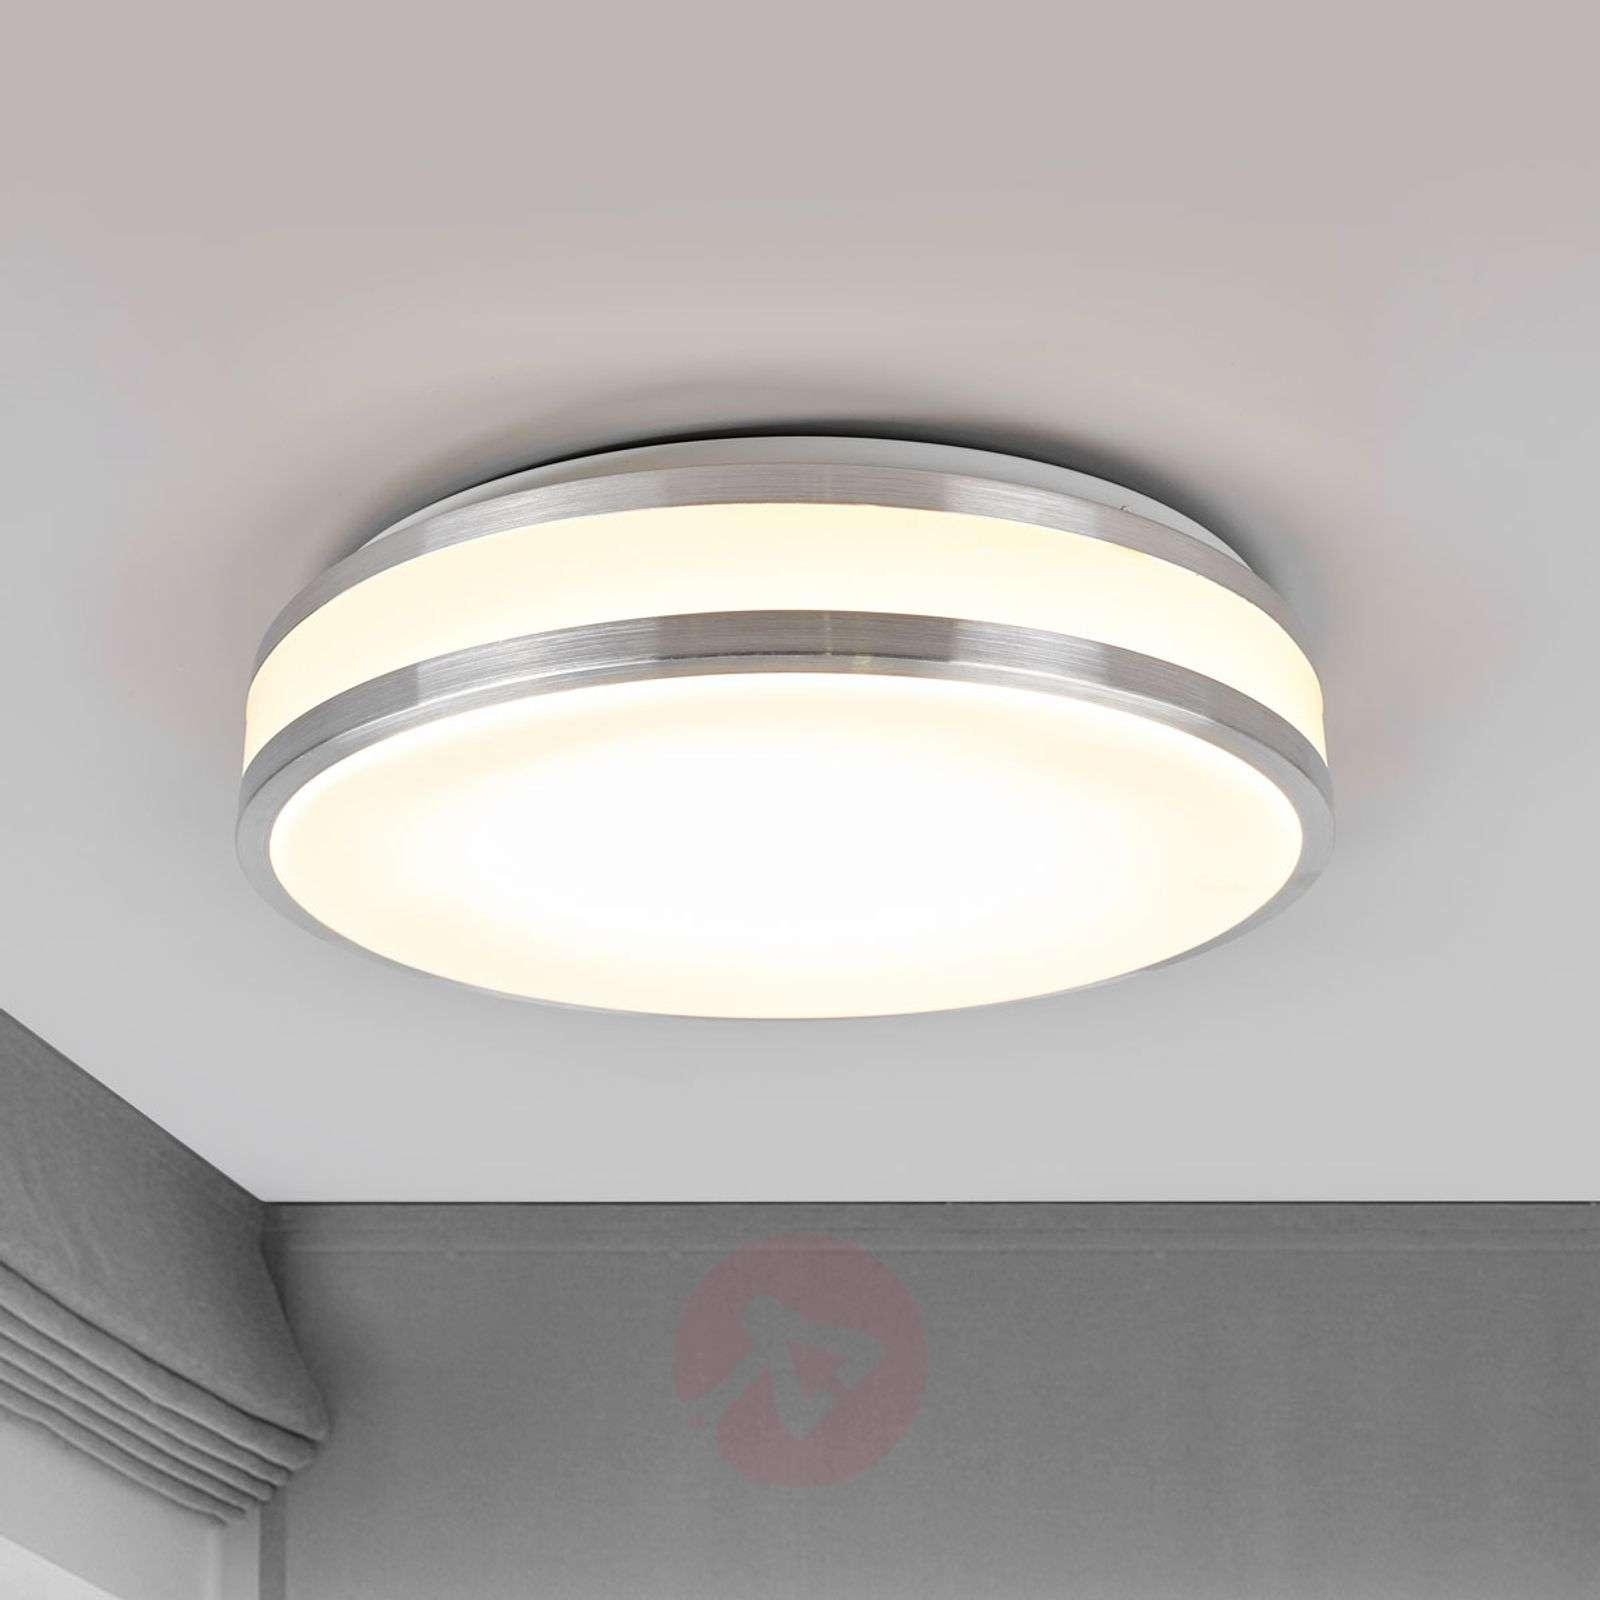 Living Room Ceiling Light Edona With Bright LEDs